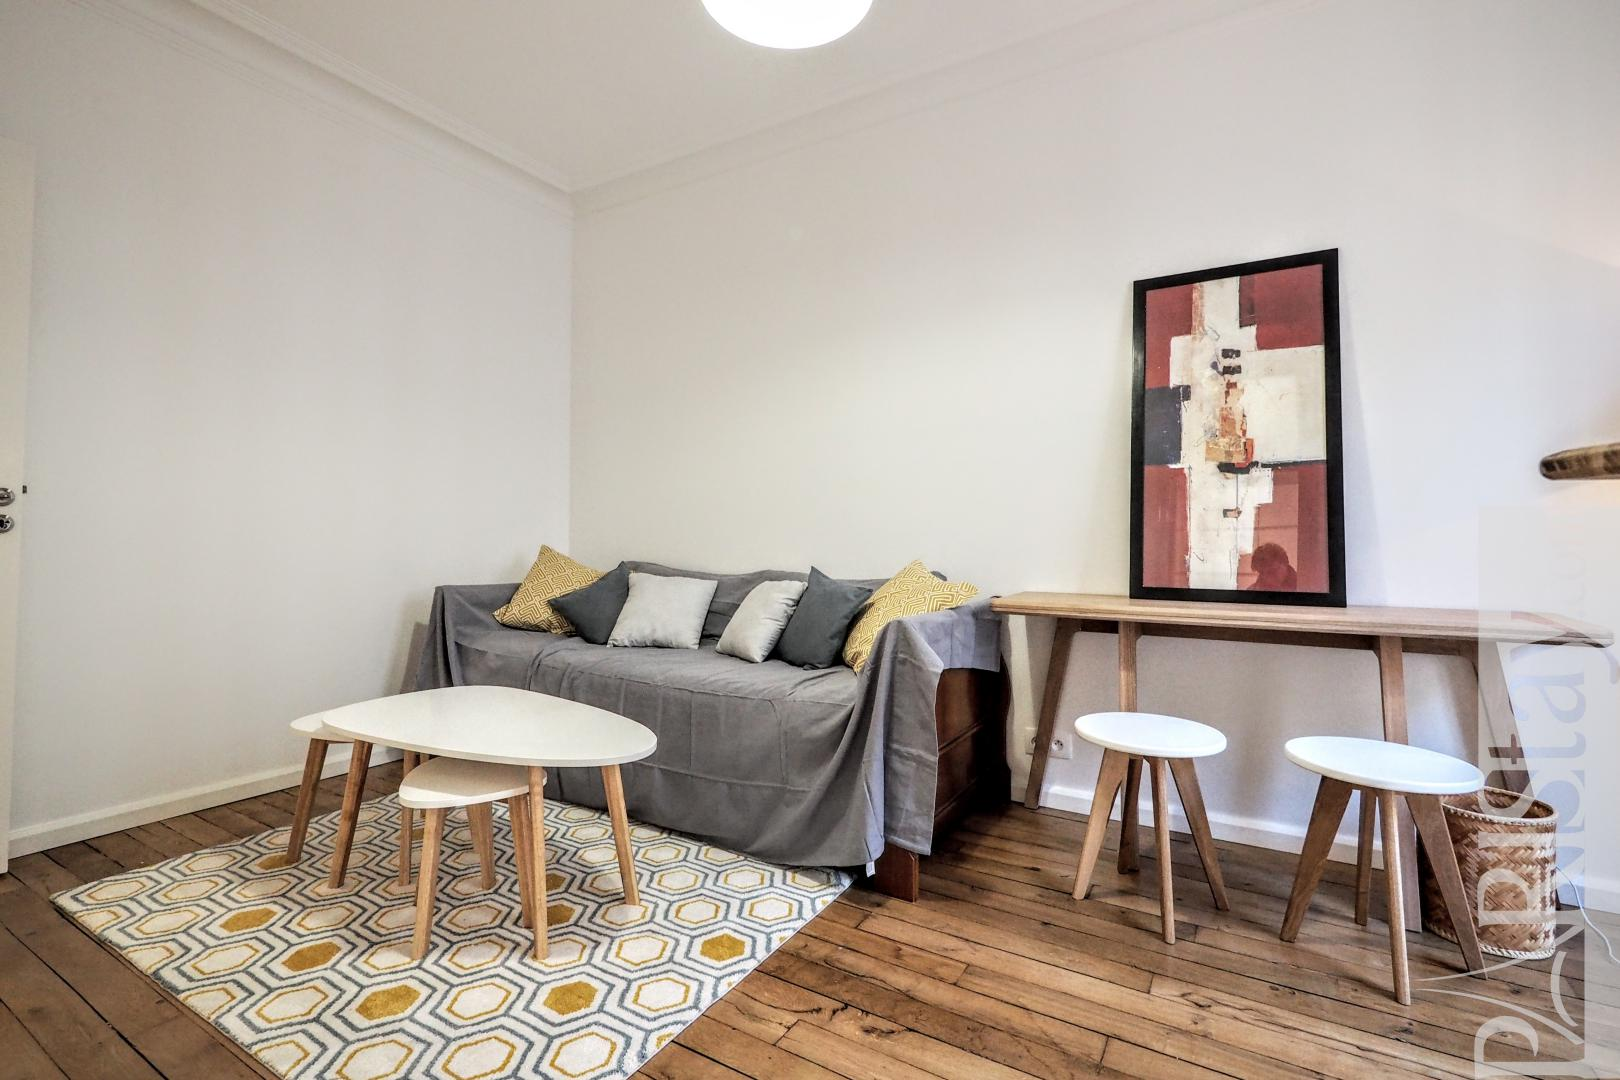 Paris apartment for rent furnished studio Montmartre Caulaincourt